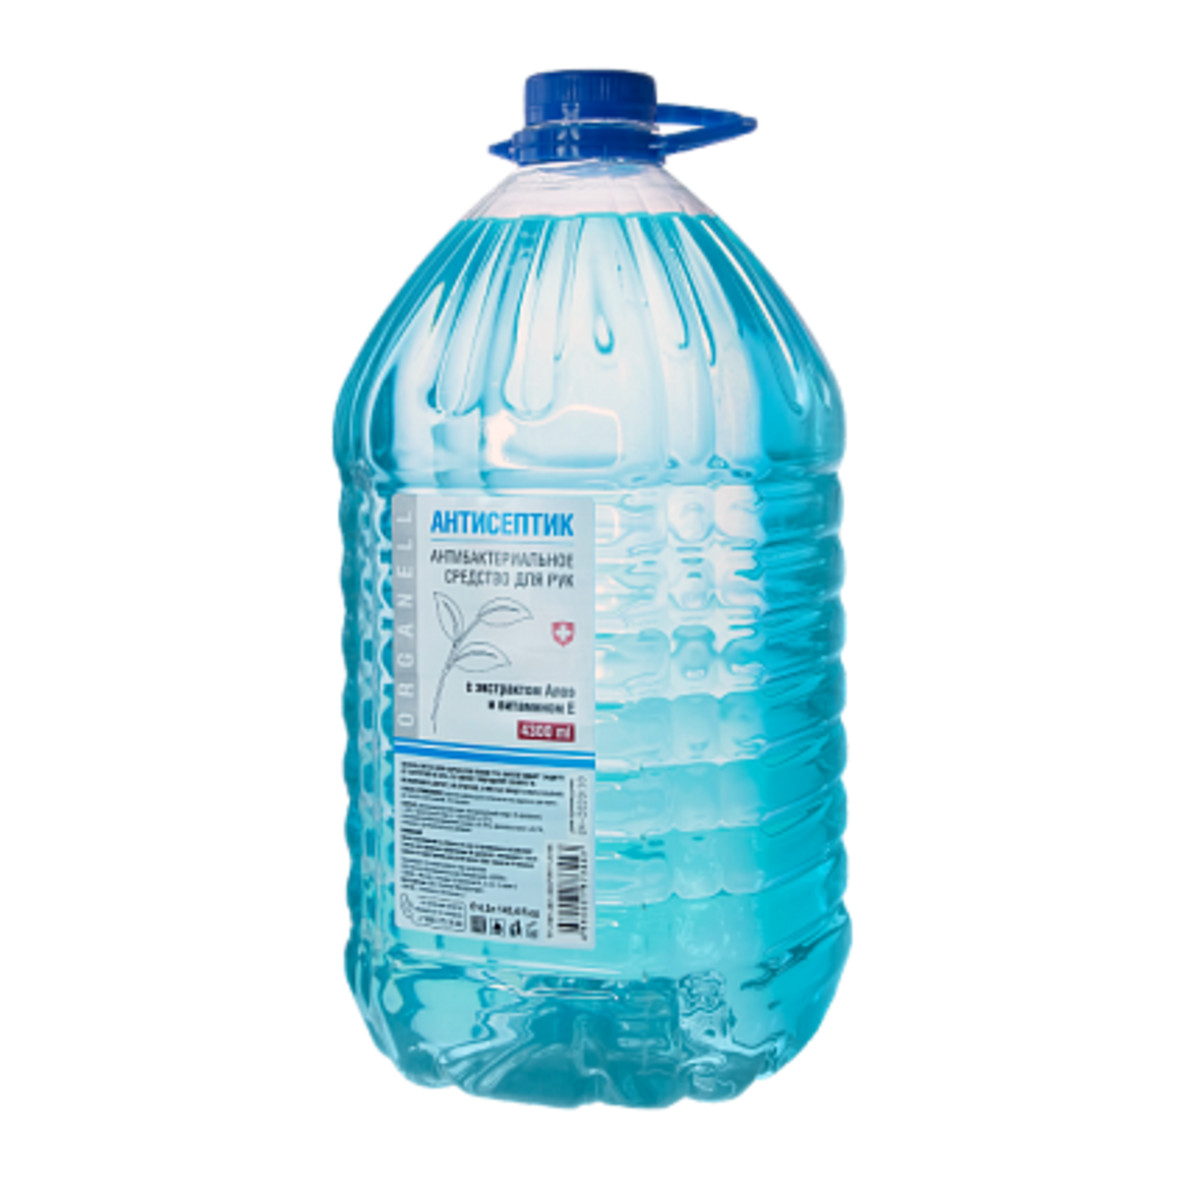 Антибактериальное средство для рук ORGANELL 43 л